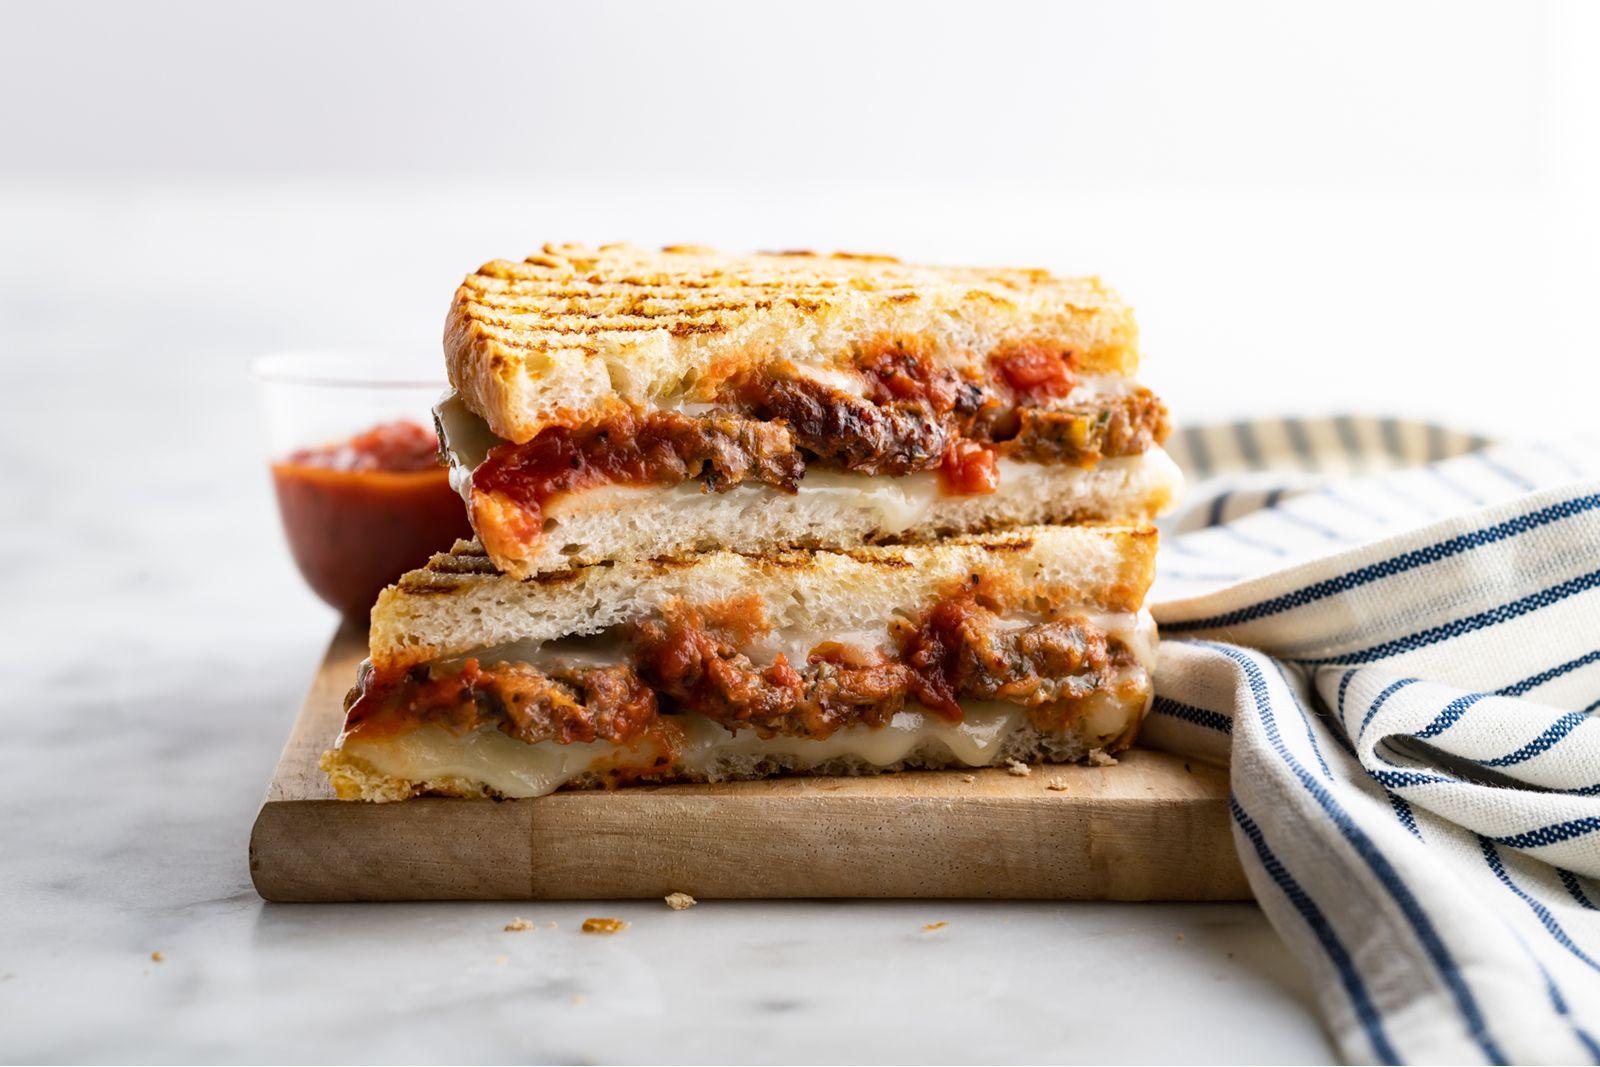 Corner Bakery x Beyond Meat Meatball Panini